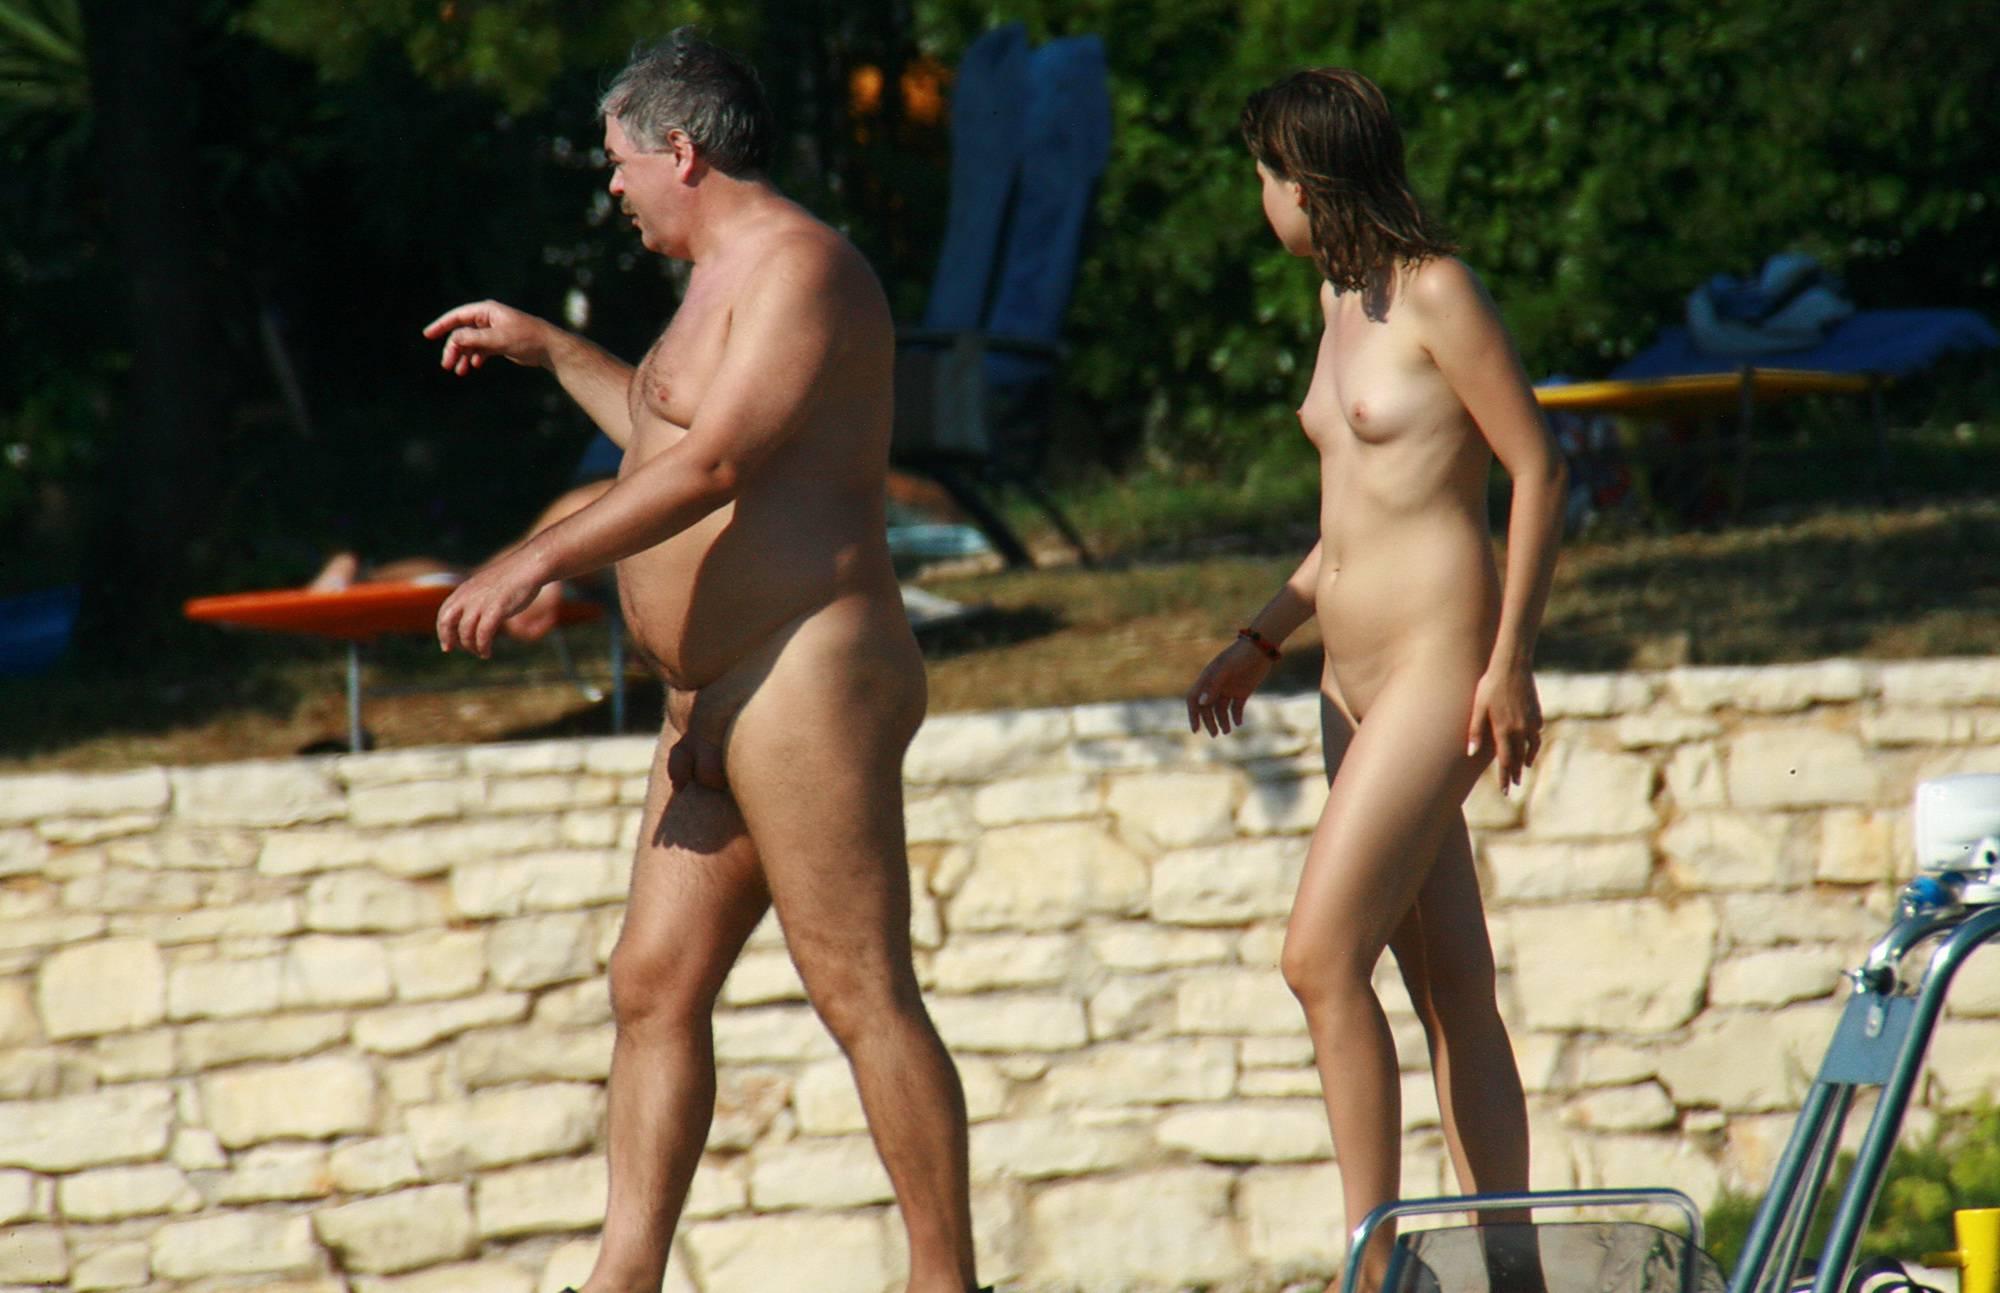 Nudist Pics Strolling On The Veranda - 1